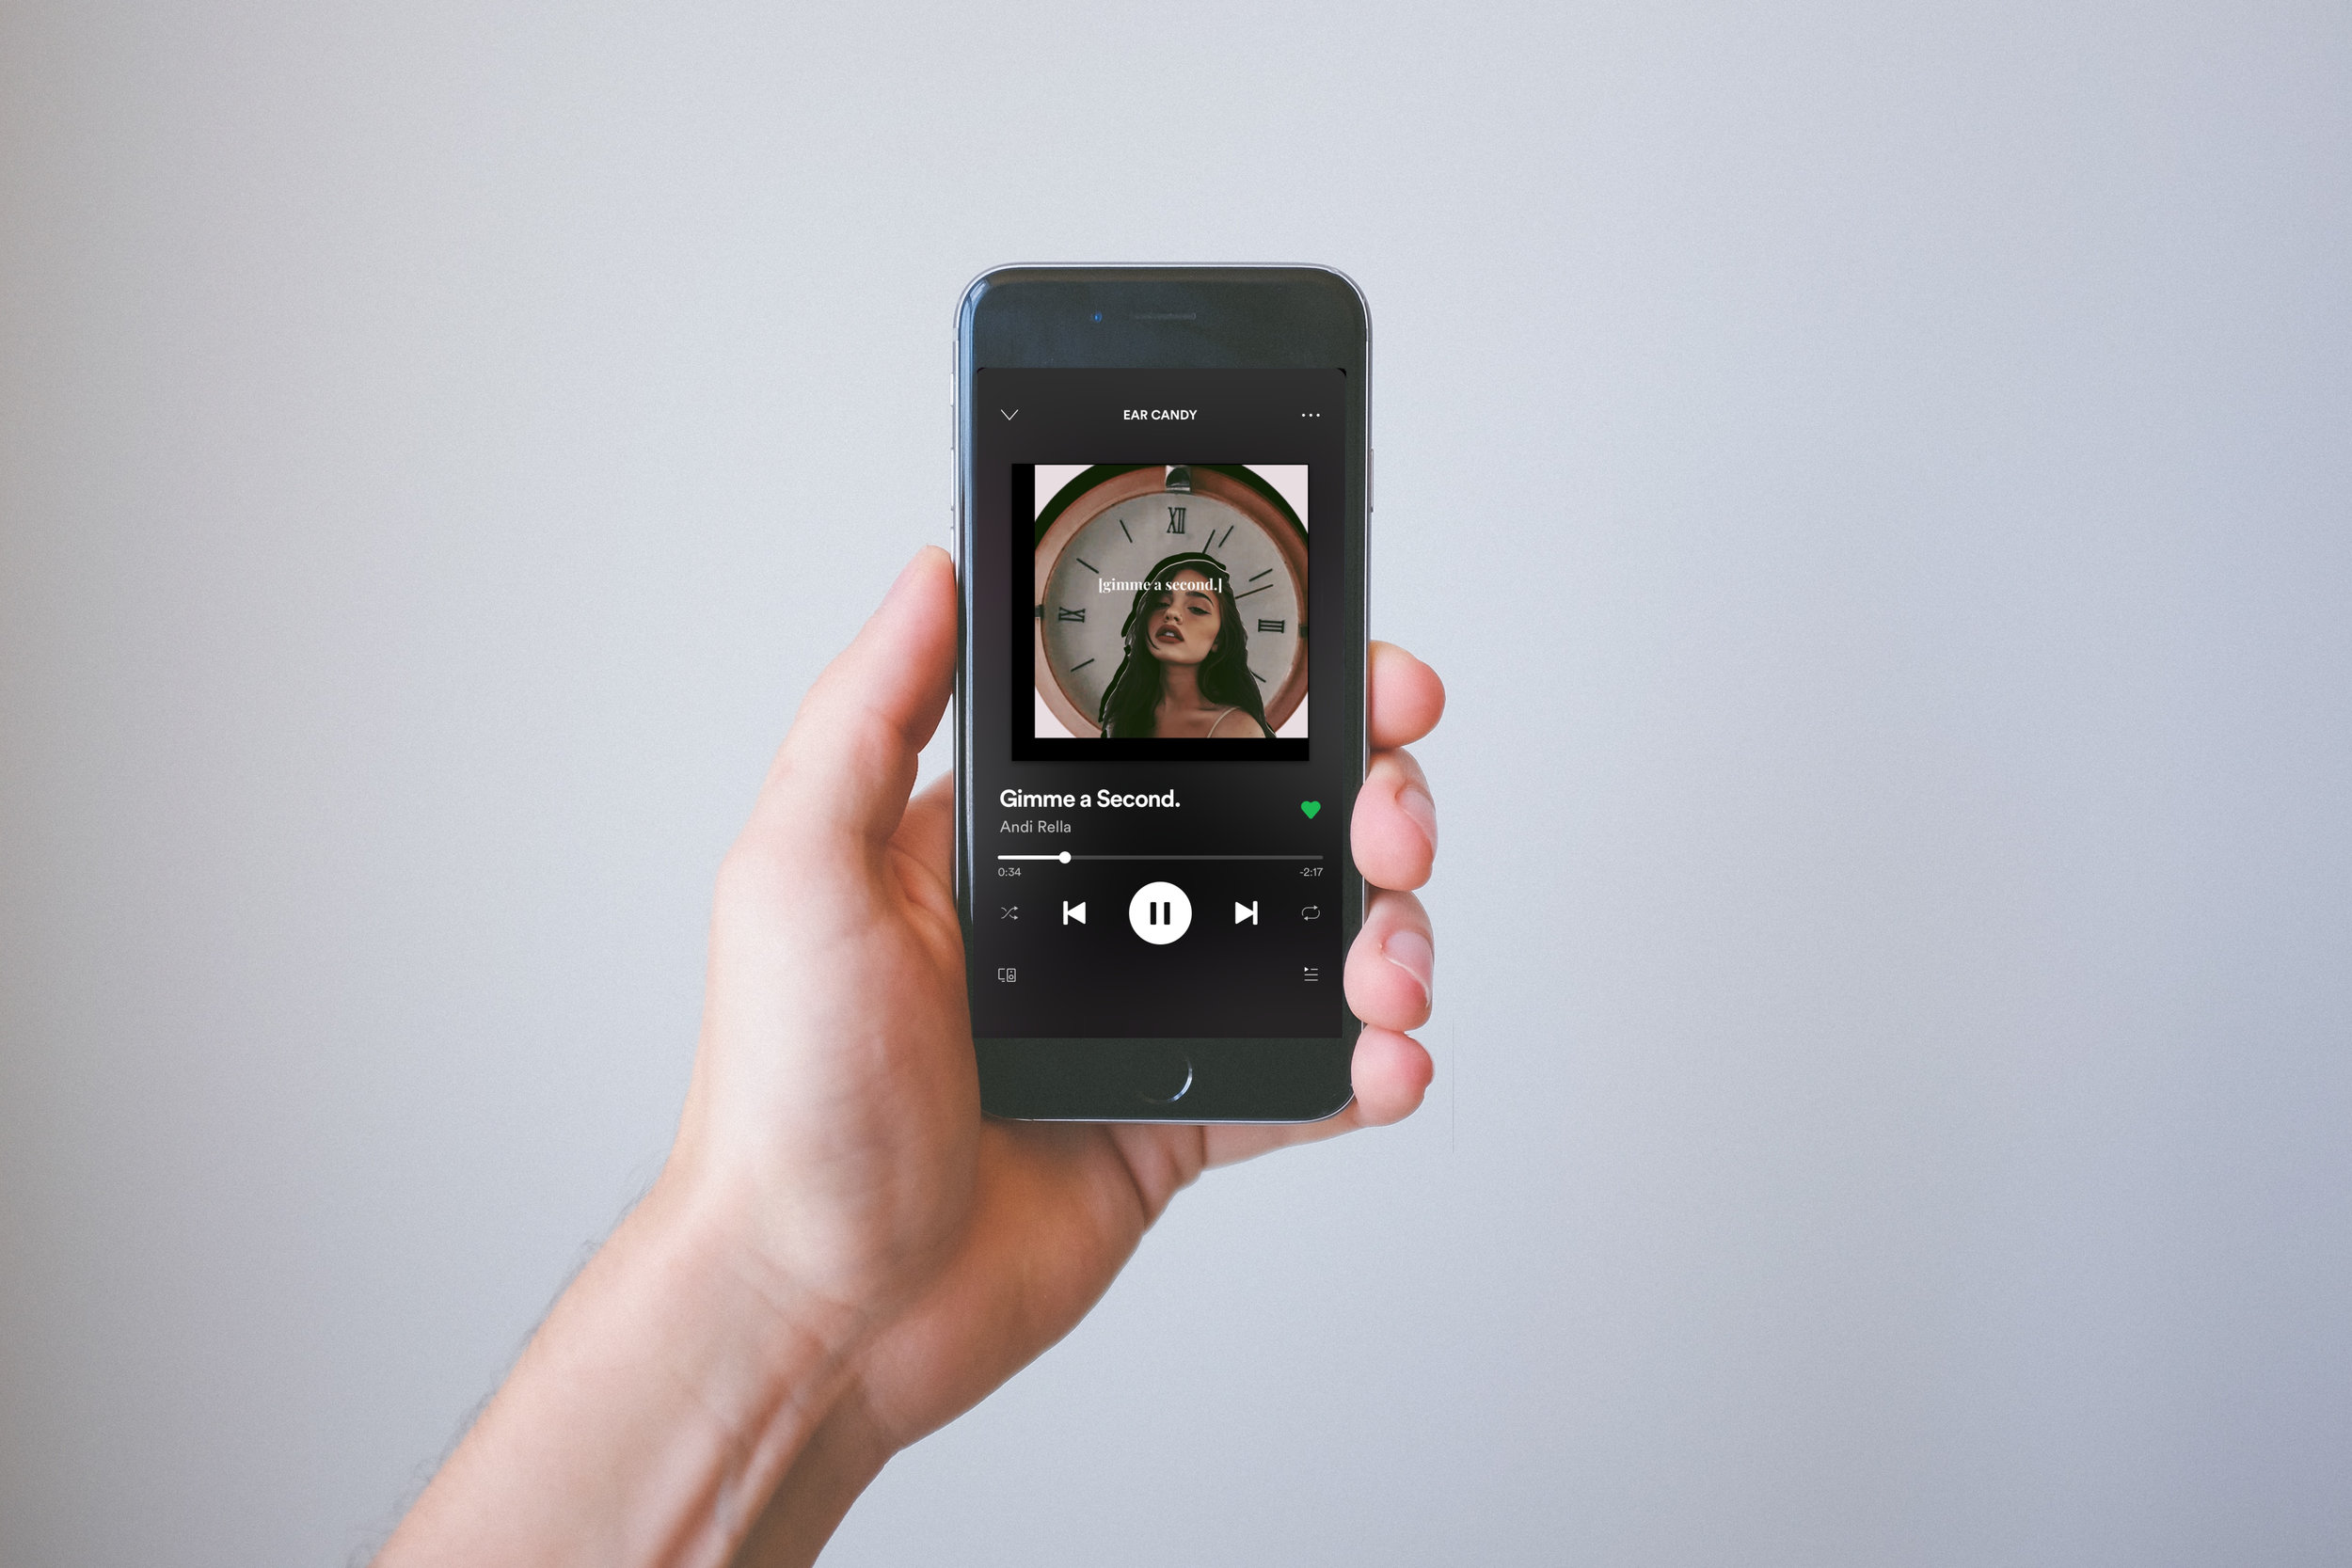 EAR iphone plays Andi Rella.jpg